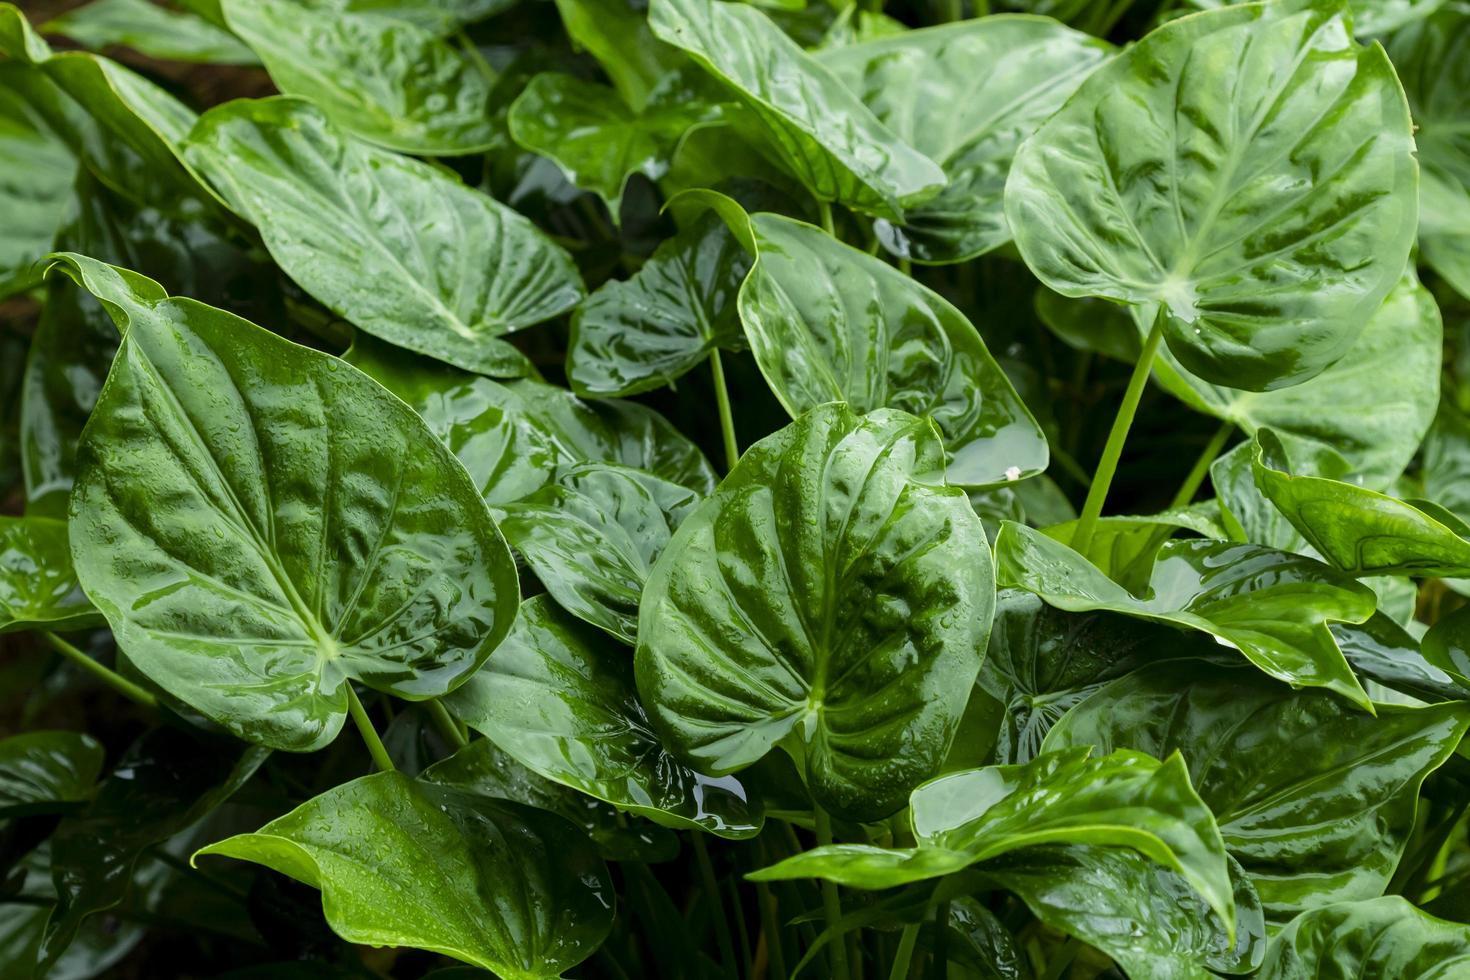 hojas verdes de cerca foto